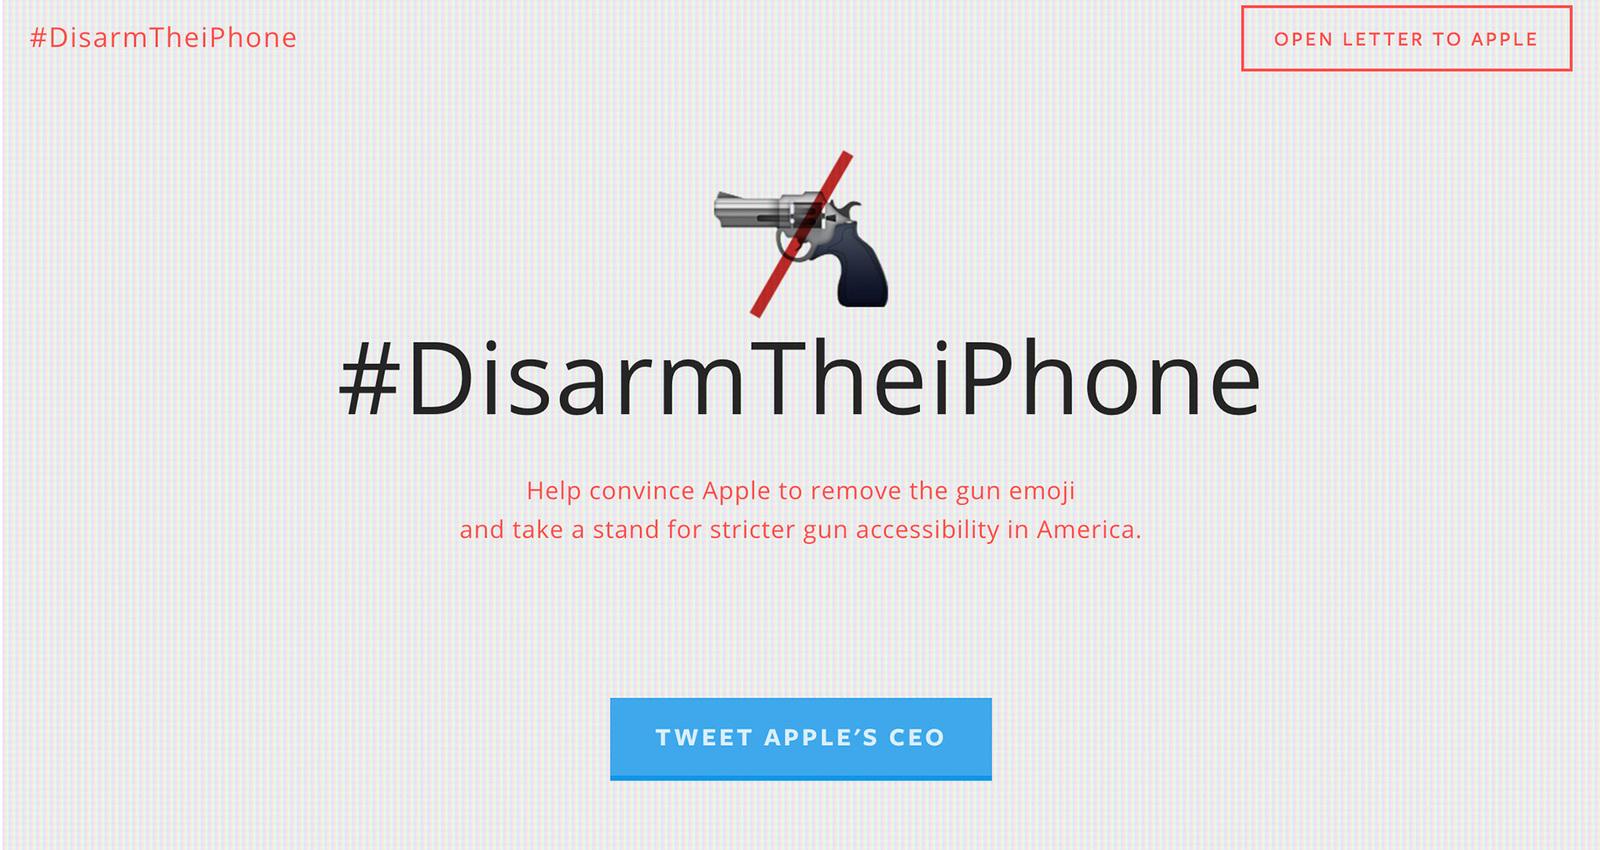 #Disarmtheiphone